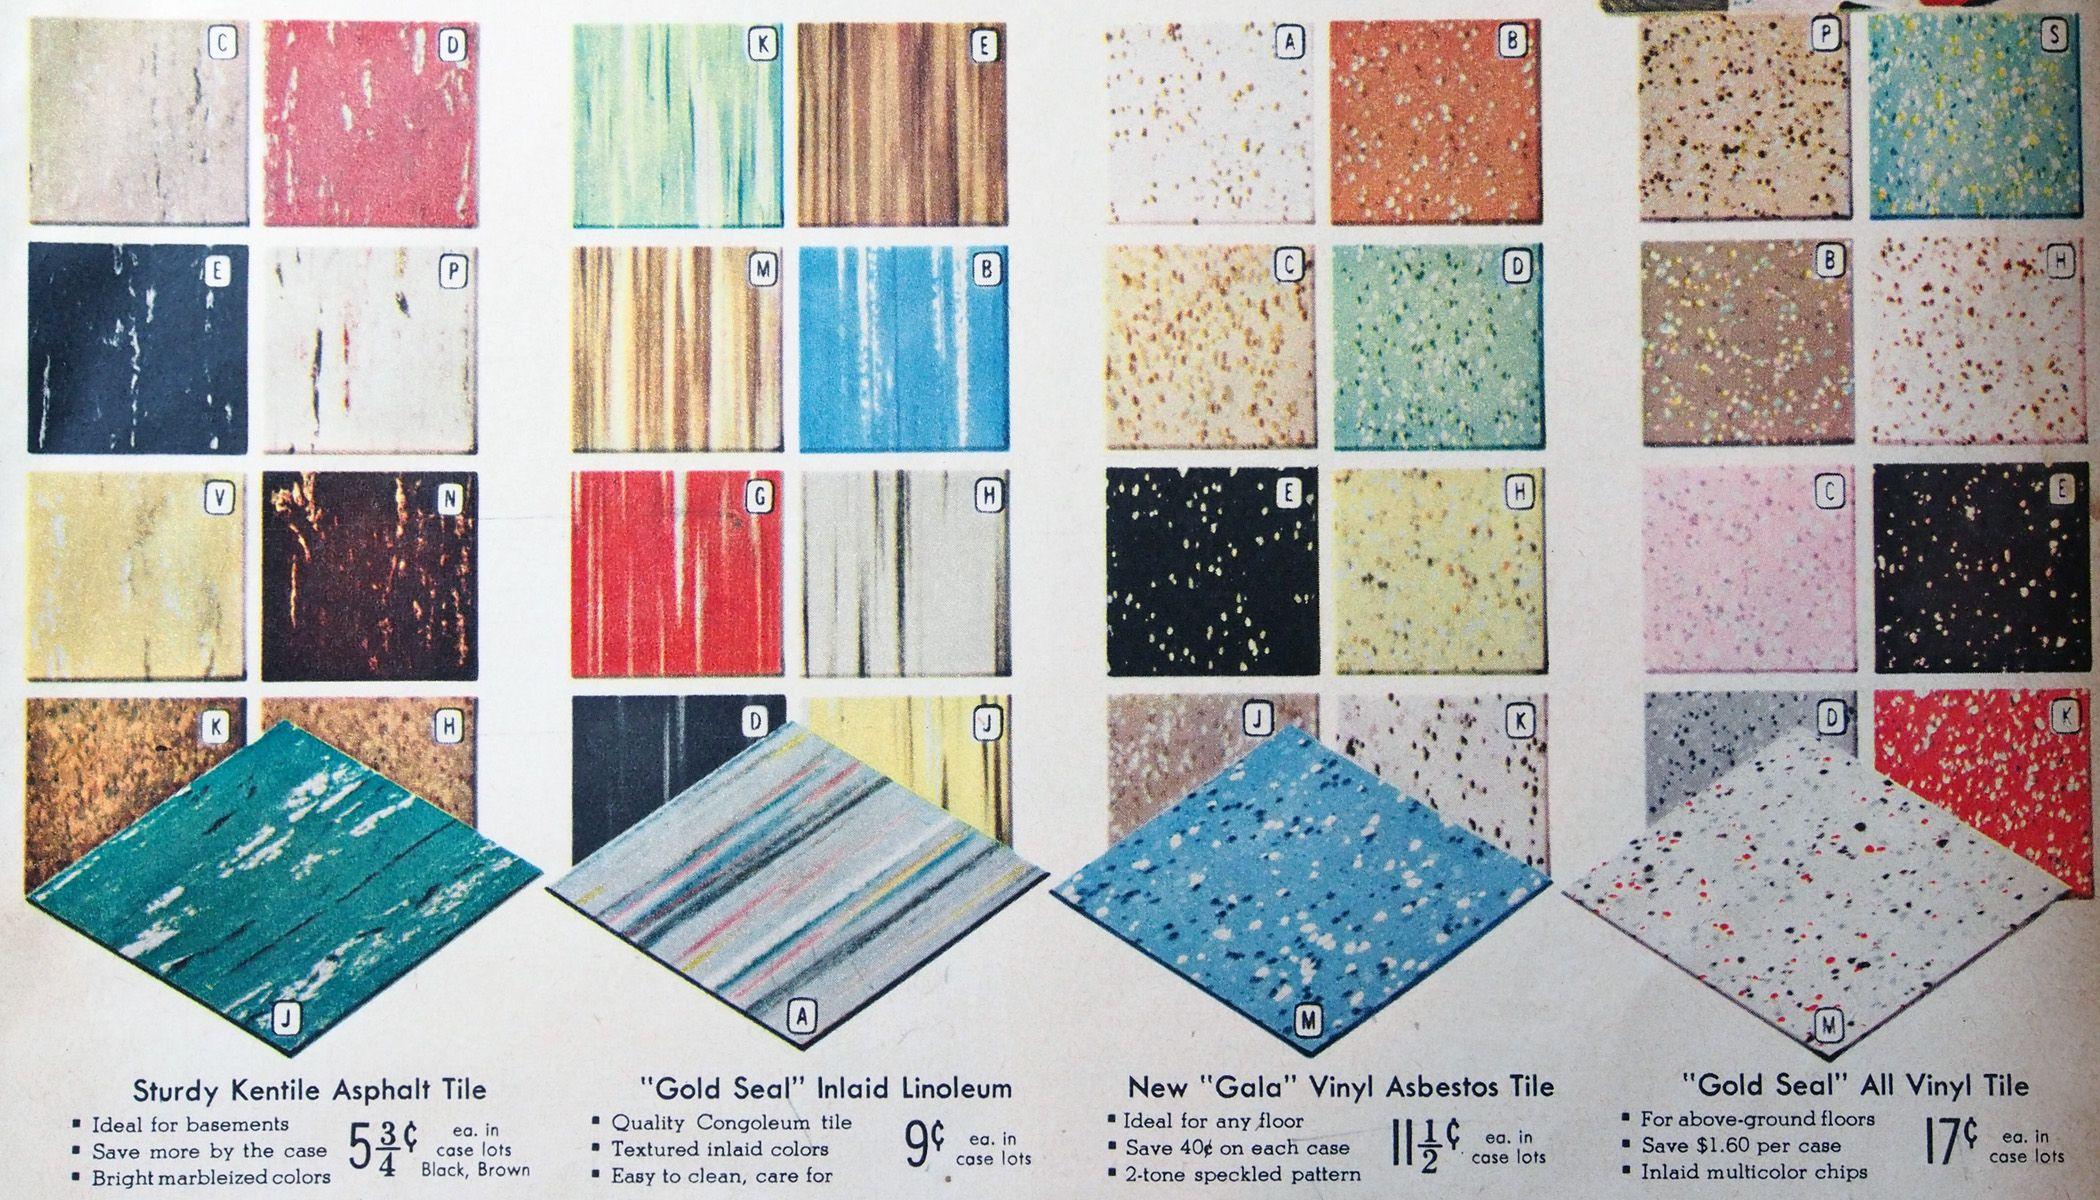 Vintage flooring options, 1950s Spiegel catalogue